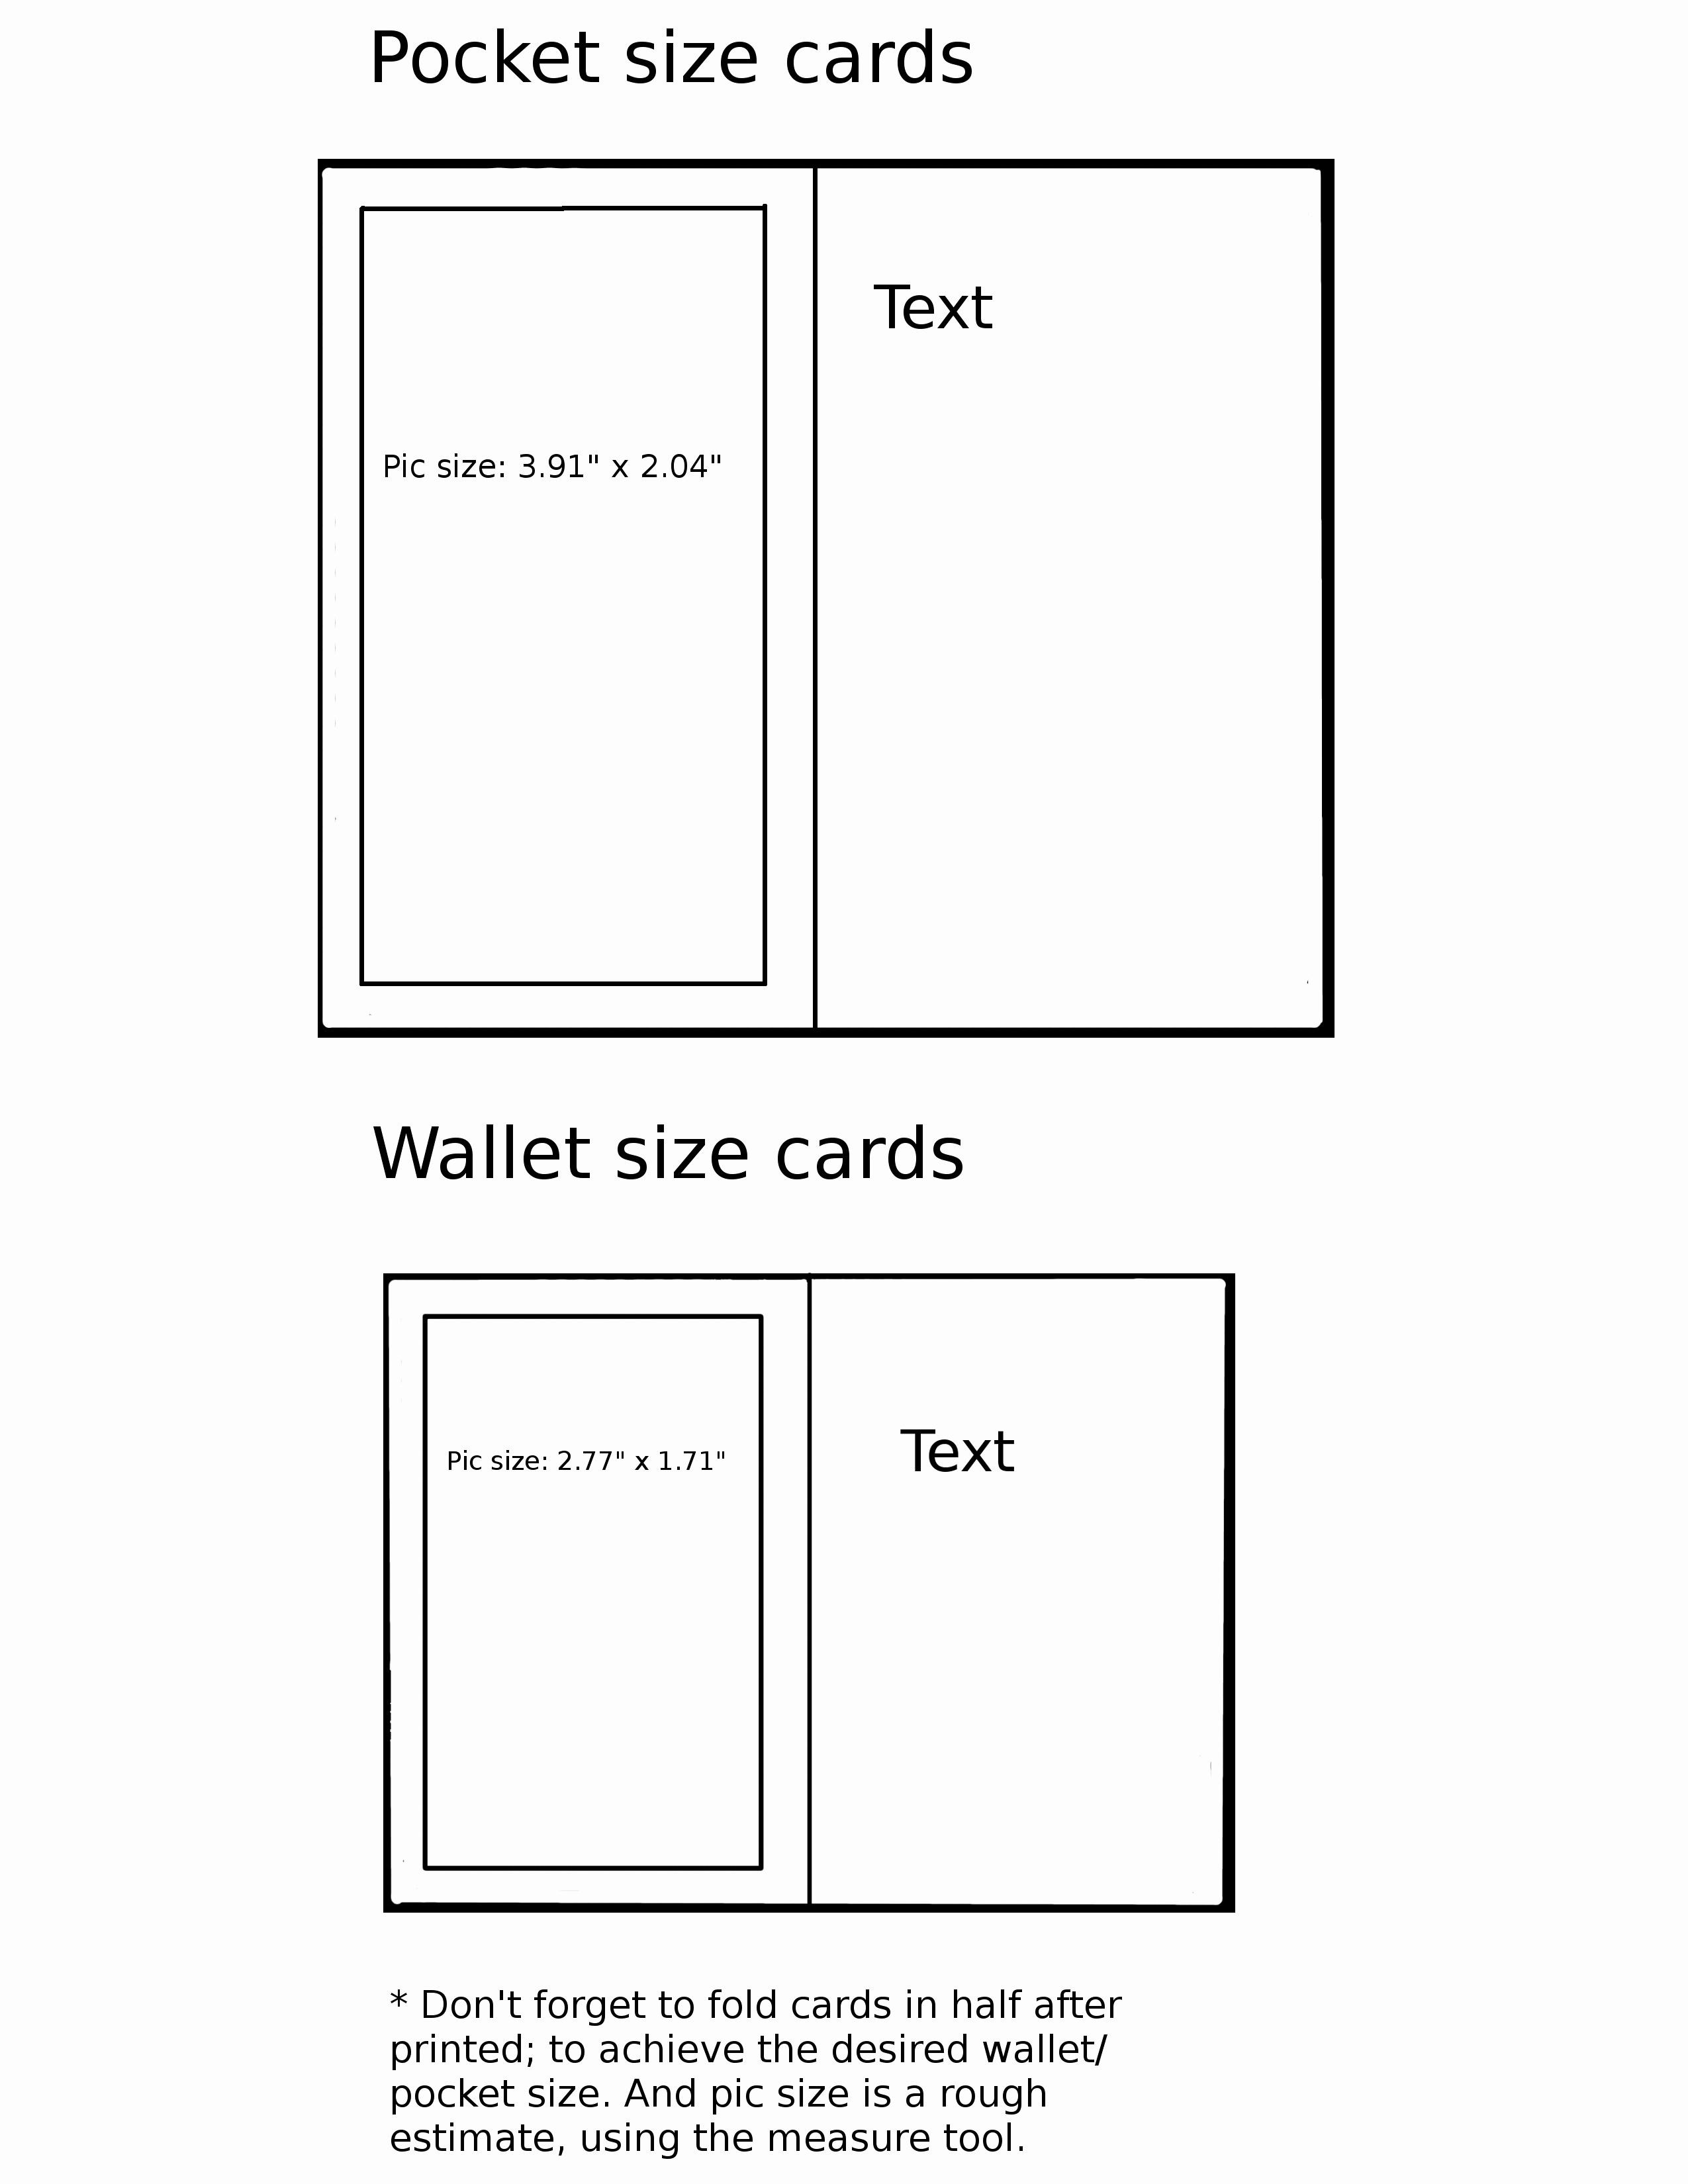 Wallet Card Template Free Inspirational Pocket Wallet Card Template by Mystictempest On Deviantart